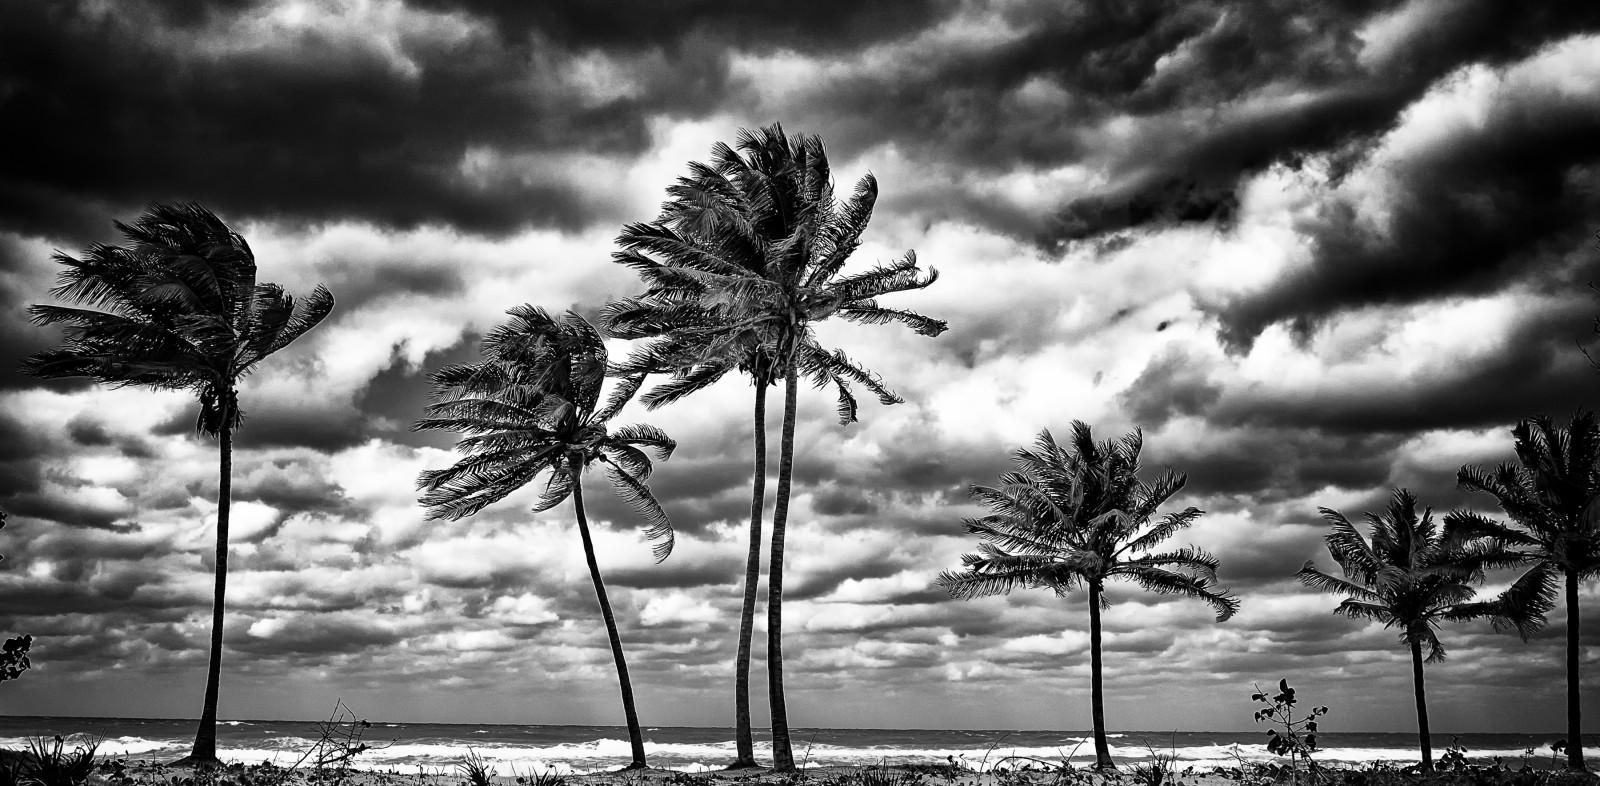 Wallpaper : trees, landscape, dark, sea, water, nature ...